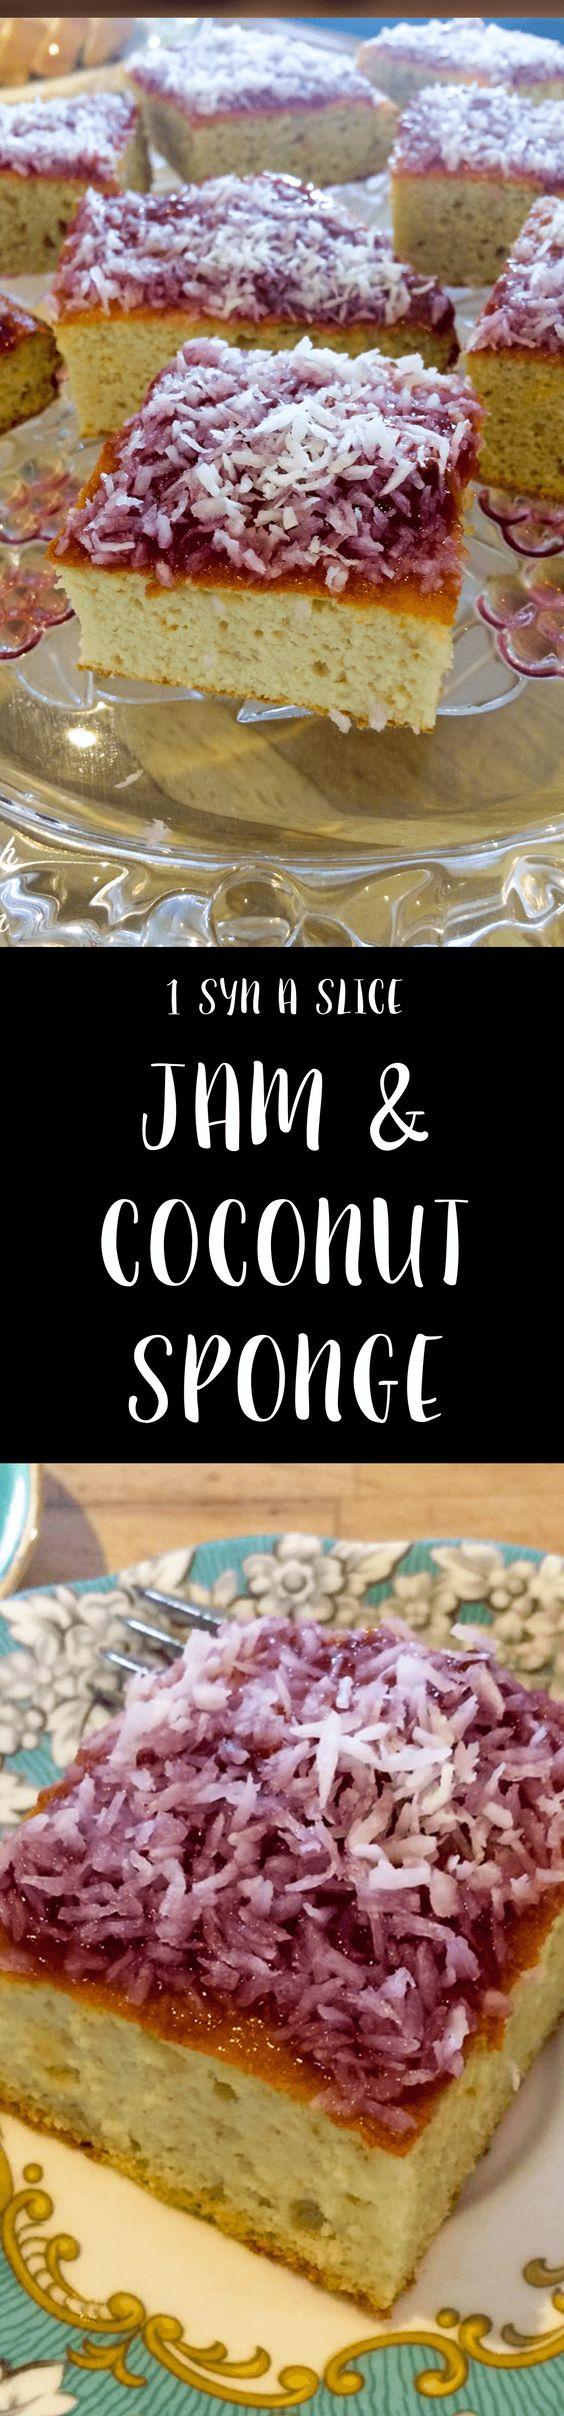 1 Syn A Slice Jam And Coconut Sponge | Slimming World